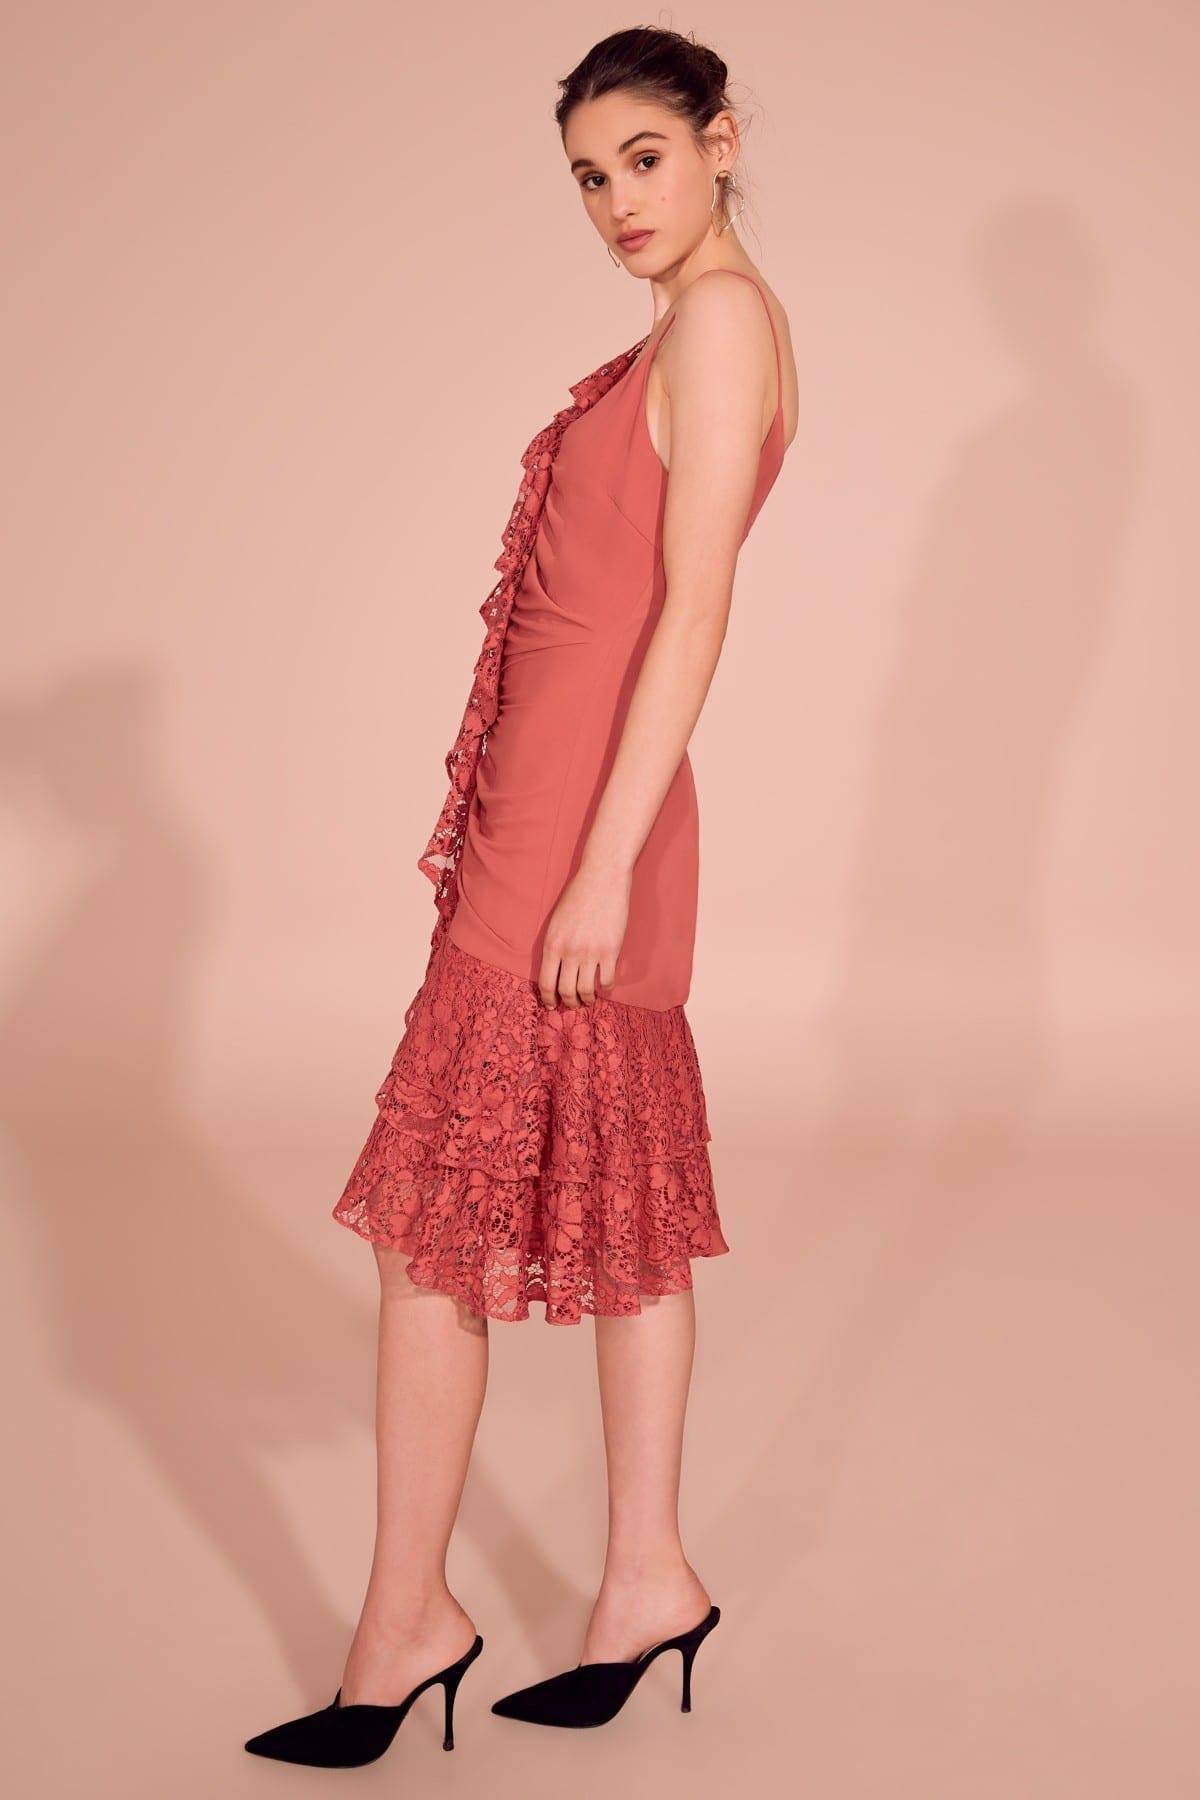 KEEPSAKE All Night Faded Rose Dress - We Select Dresses 04f455a3d